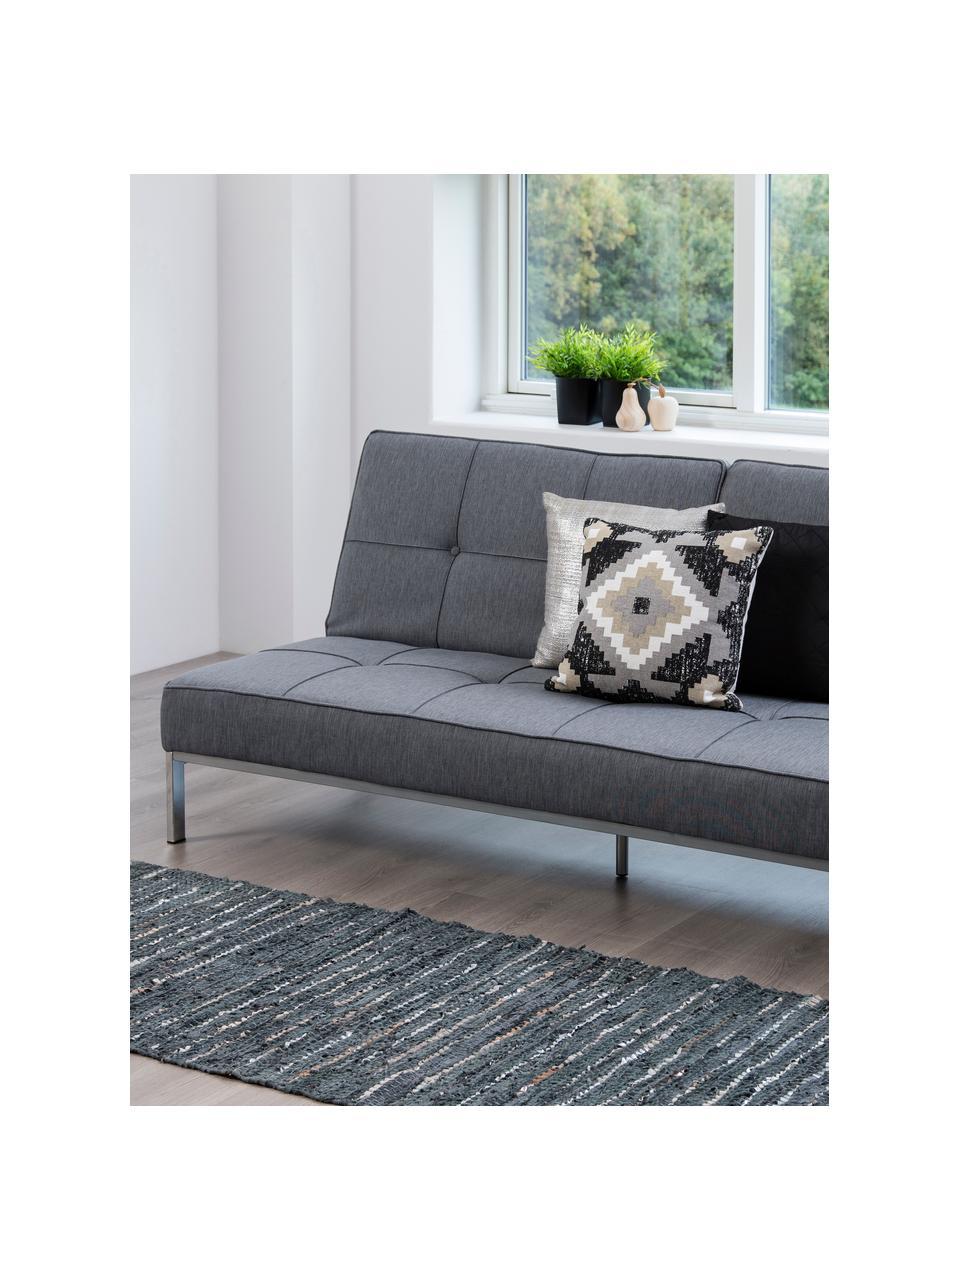 Canapé-lit gris clair Perugia, Gris clair